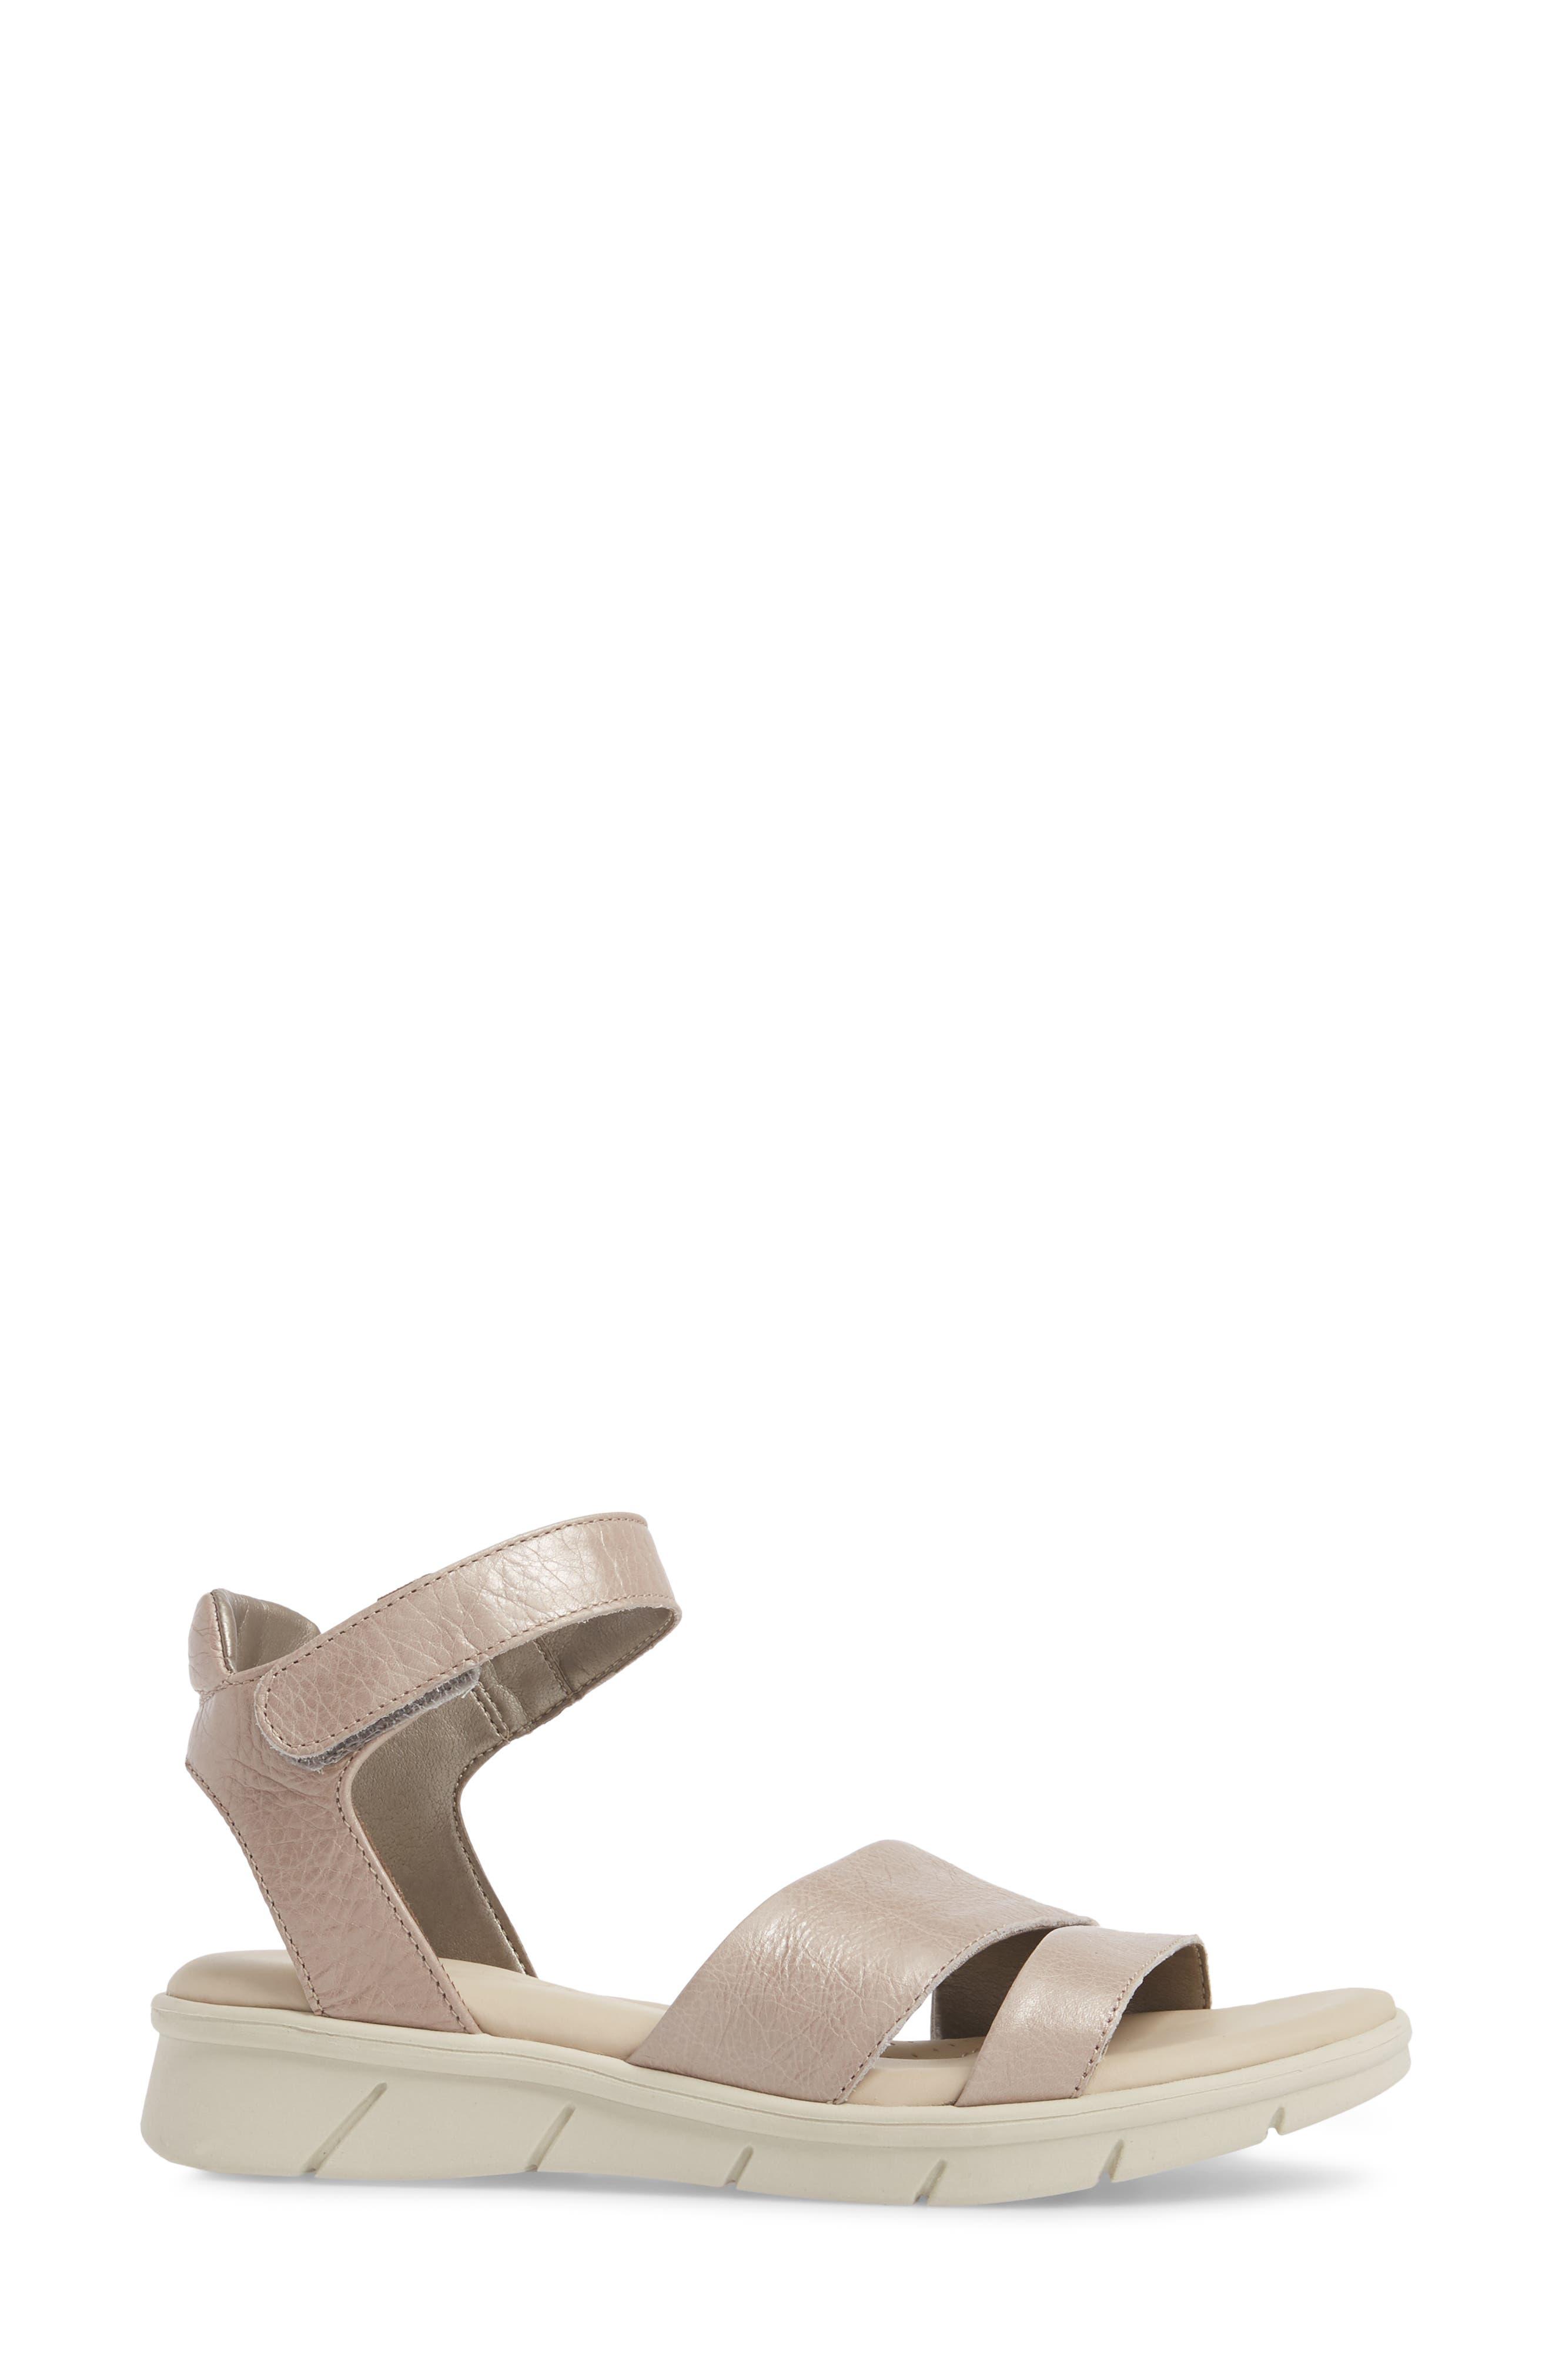 Crossover Ankle Strap Sandal,                             Alternate thumbnail 3, color,                             HAZE CRACKLED LEATHER